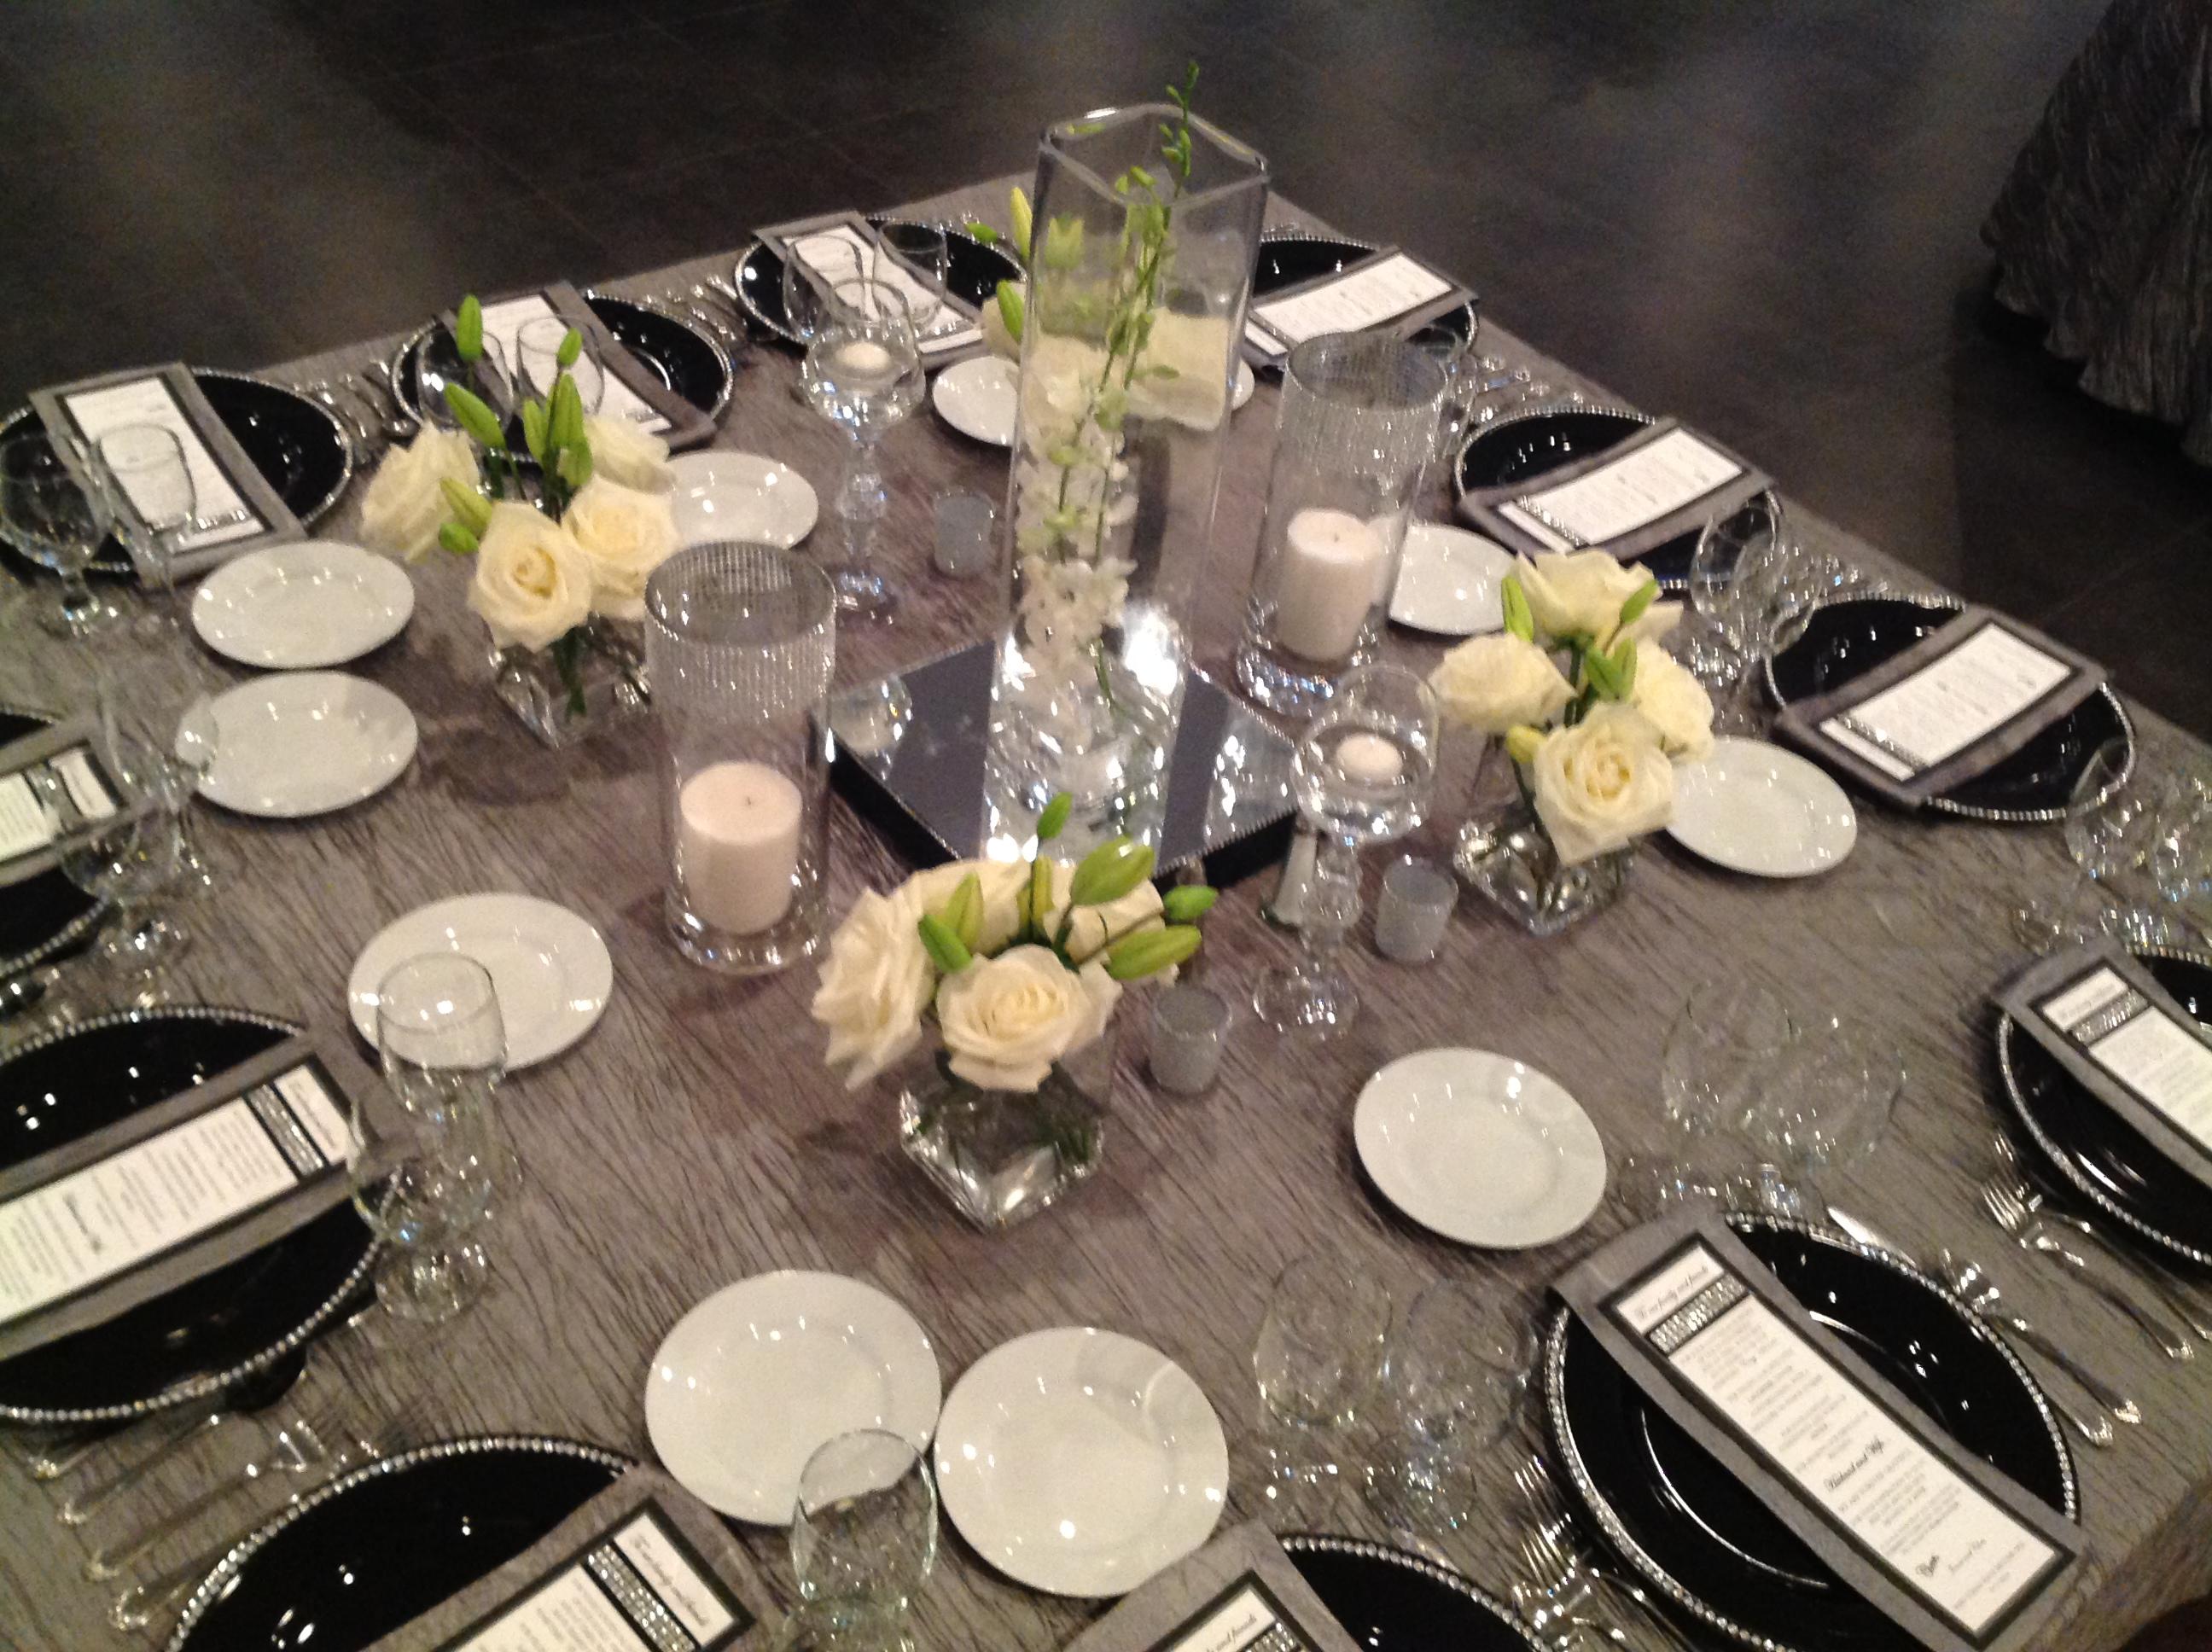 Elegant Upscale Table Setting